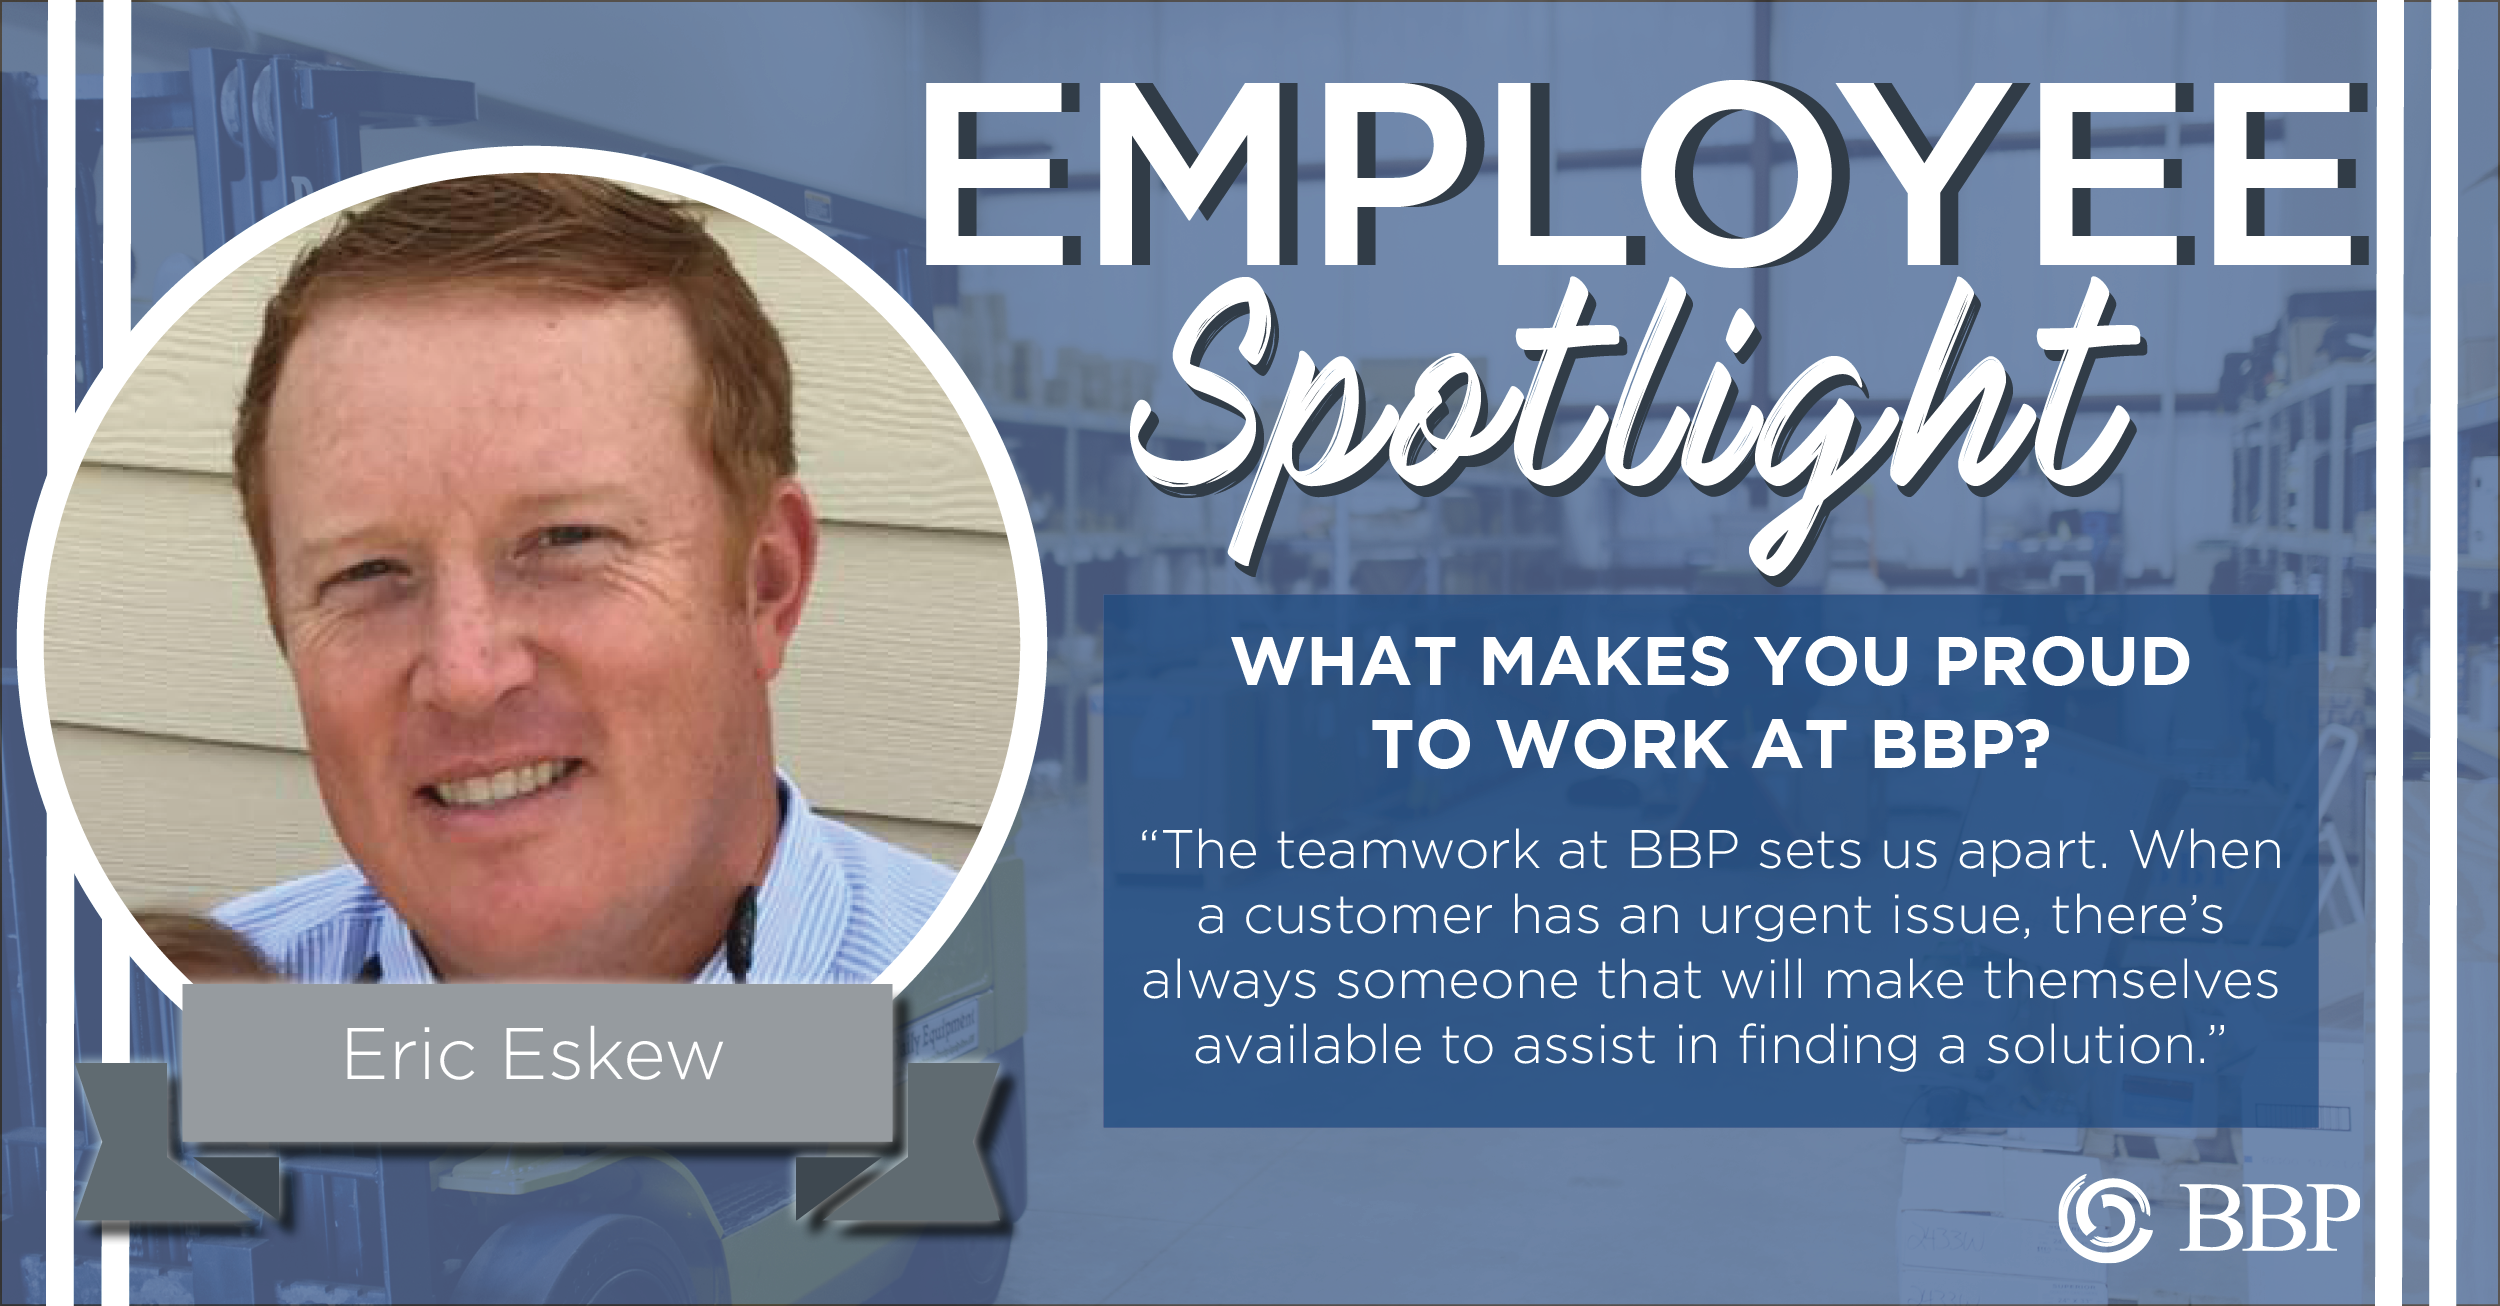 Eric Eskew Employee Spotlight